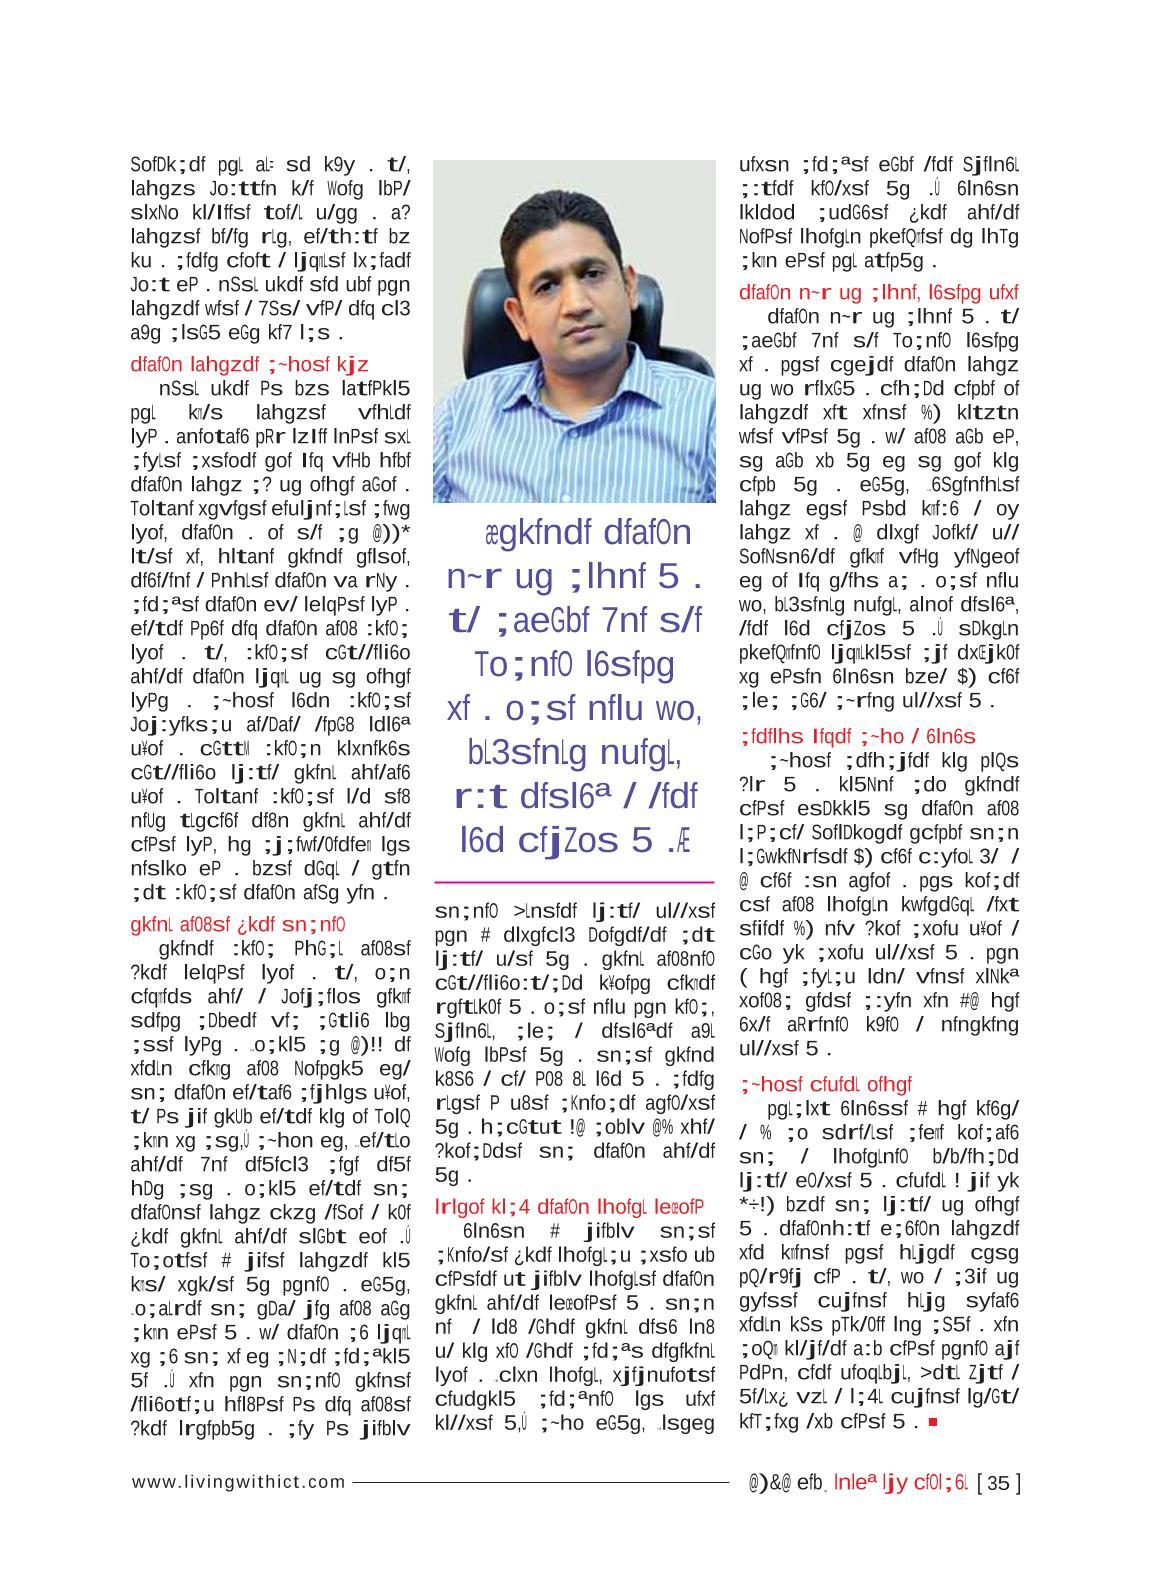 Living with ICT (आइसिटी म्यागजिन)